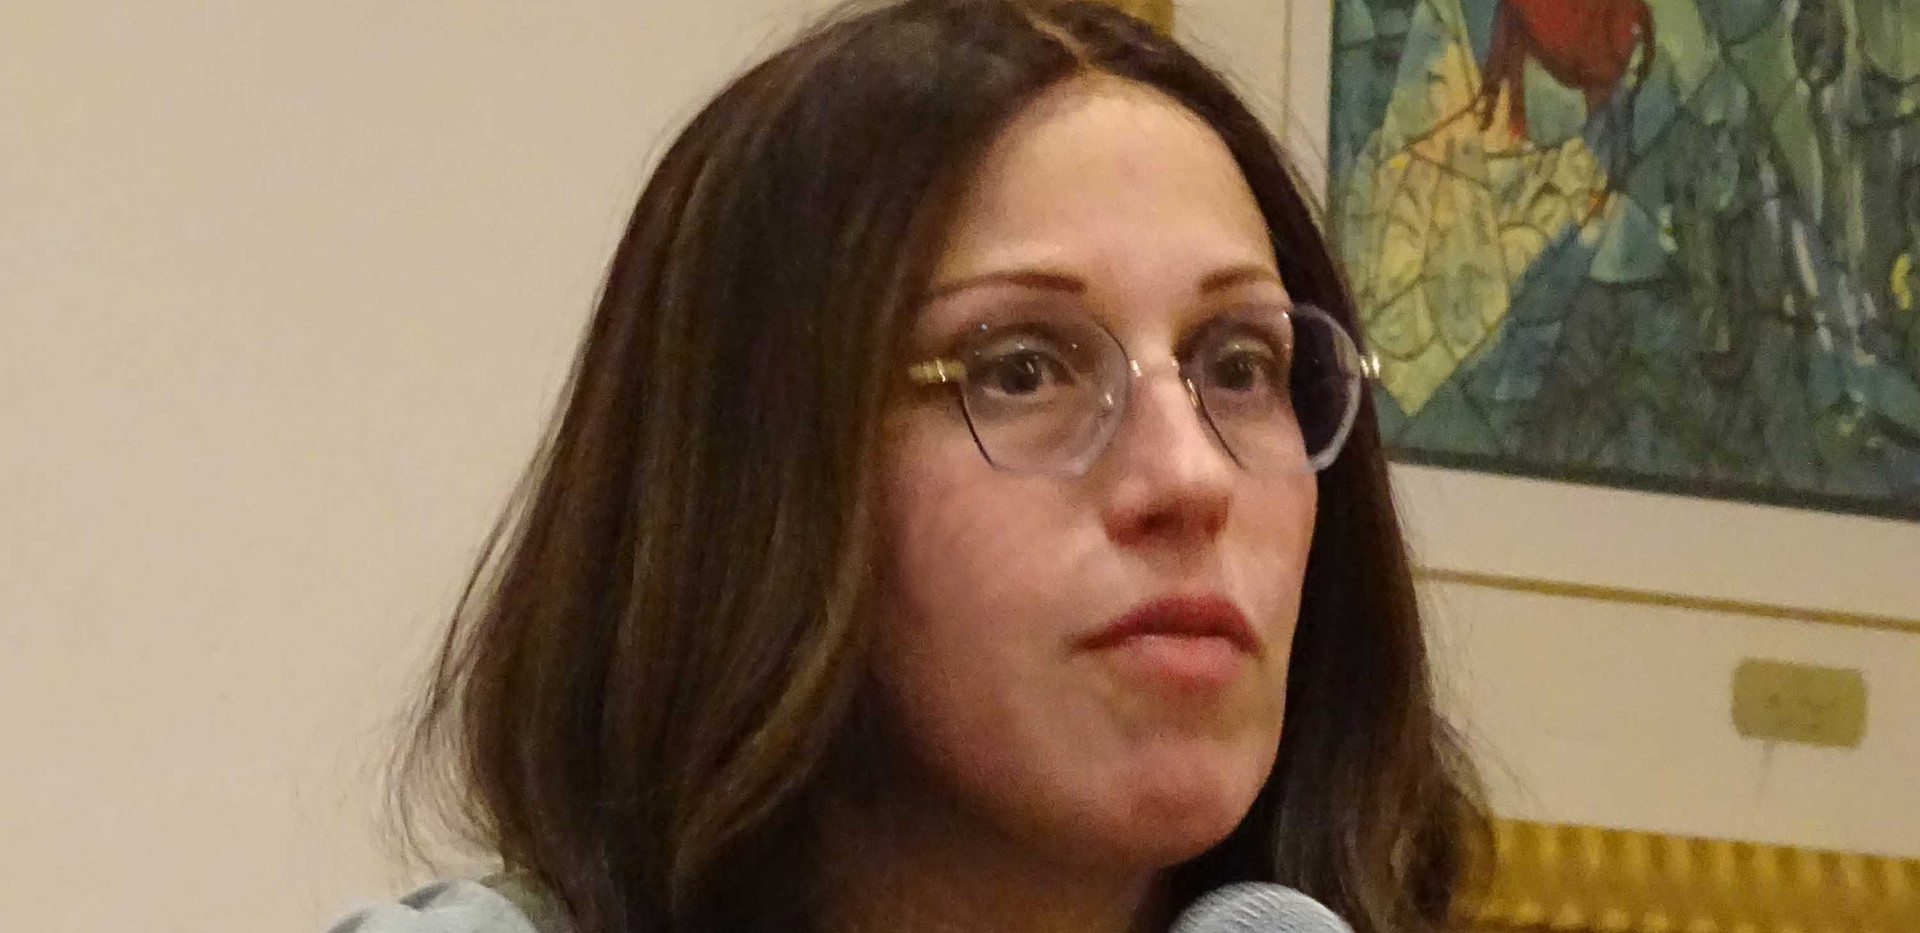 Binie Holzberg